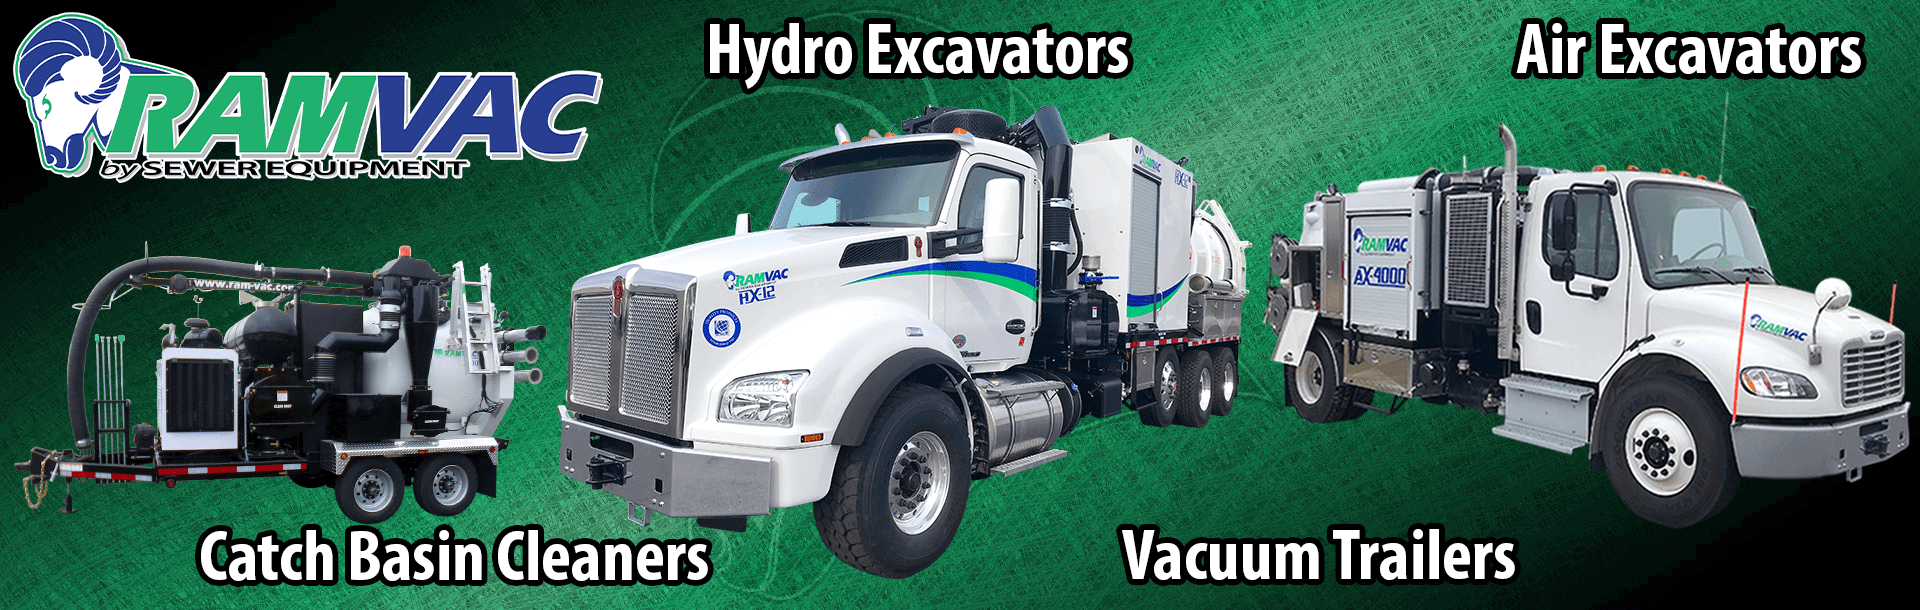 RAMVAC, Hydro Excavators, Air Excavators, Catch Basin Cleaners, Vacuum Trailers